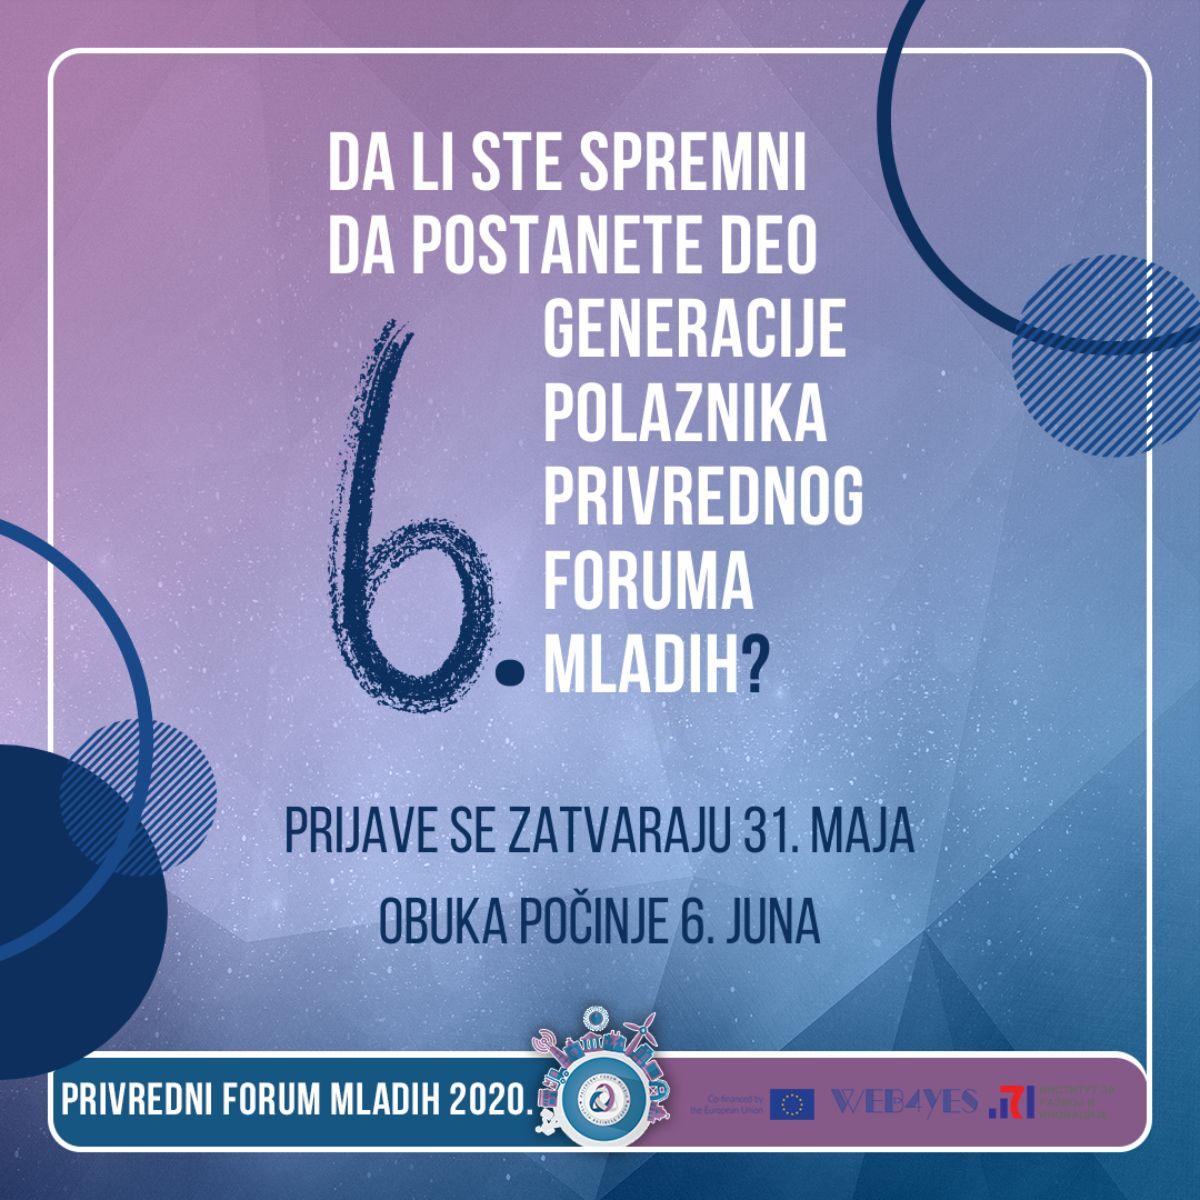 Privredni forum mladih 6.0 – online obuka za započinjanje sopstvenog biznisa